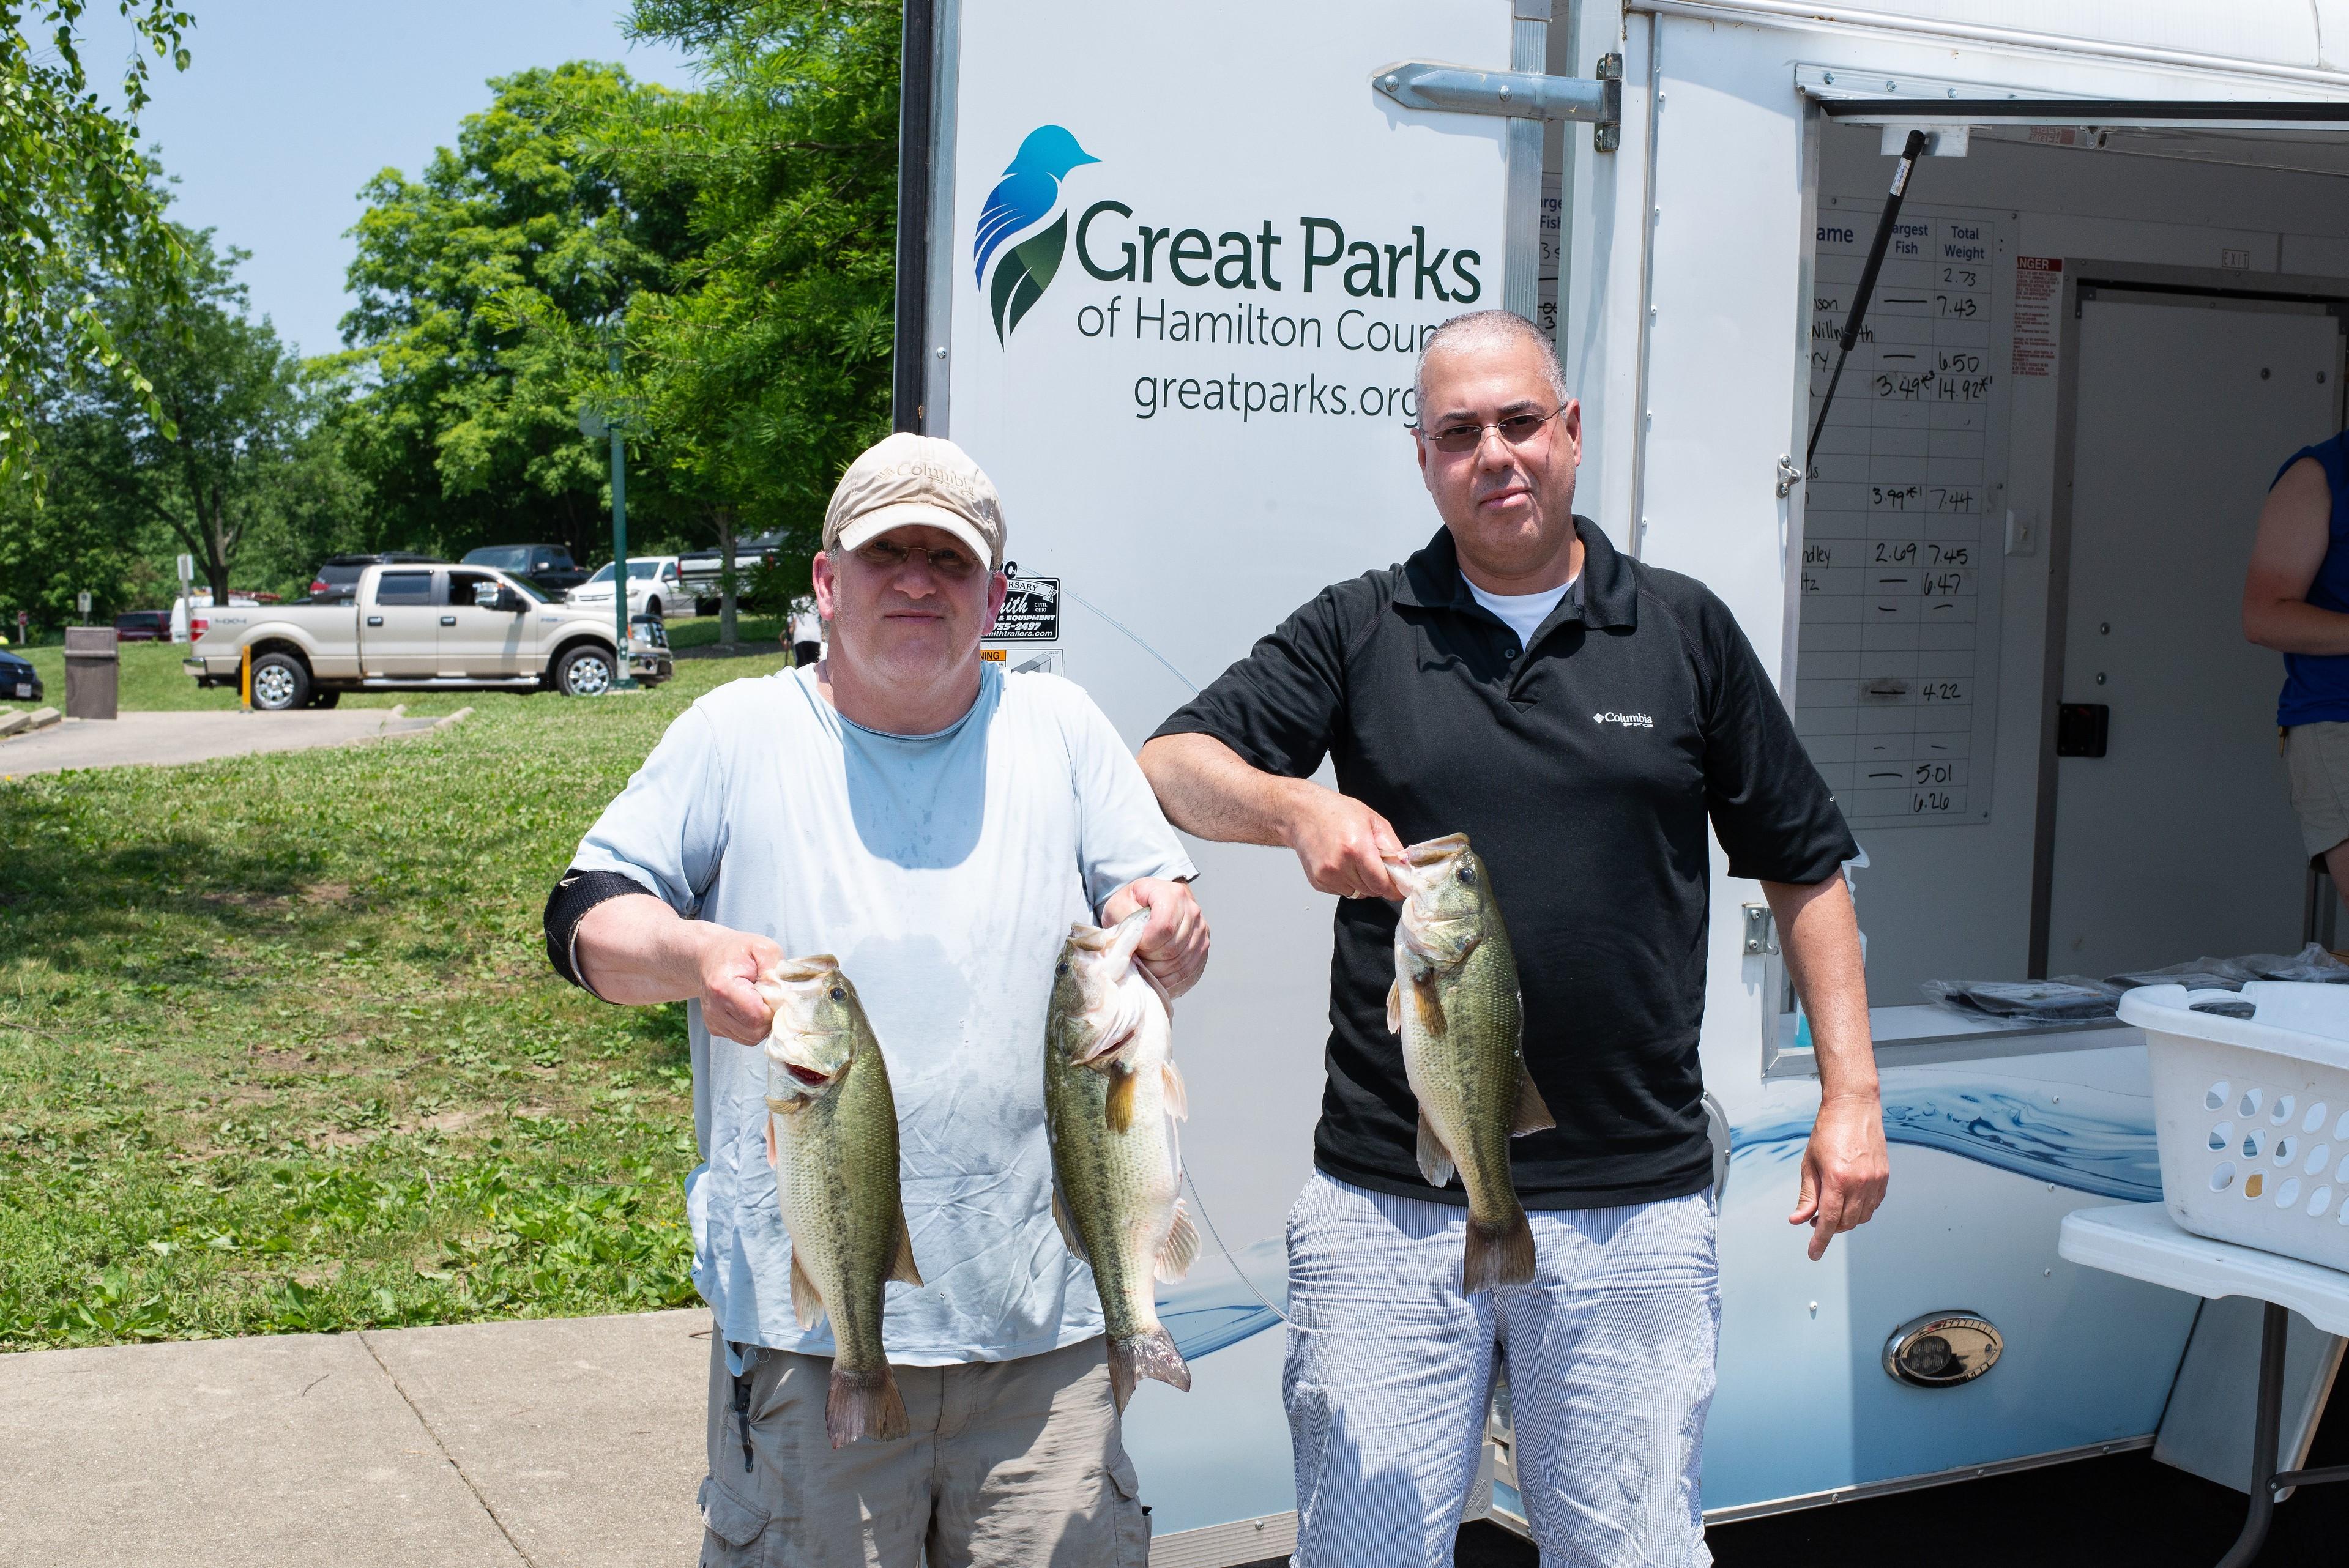 July 14 Bass Series Paul Regensburger and Julio Delgado